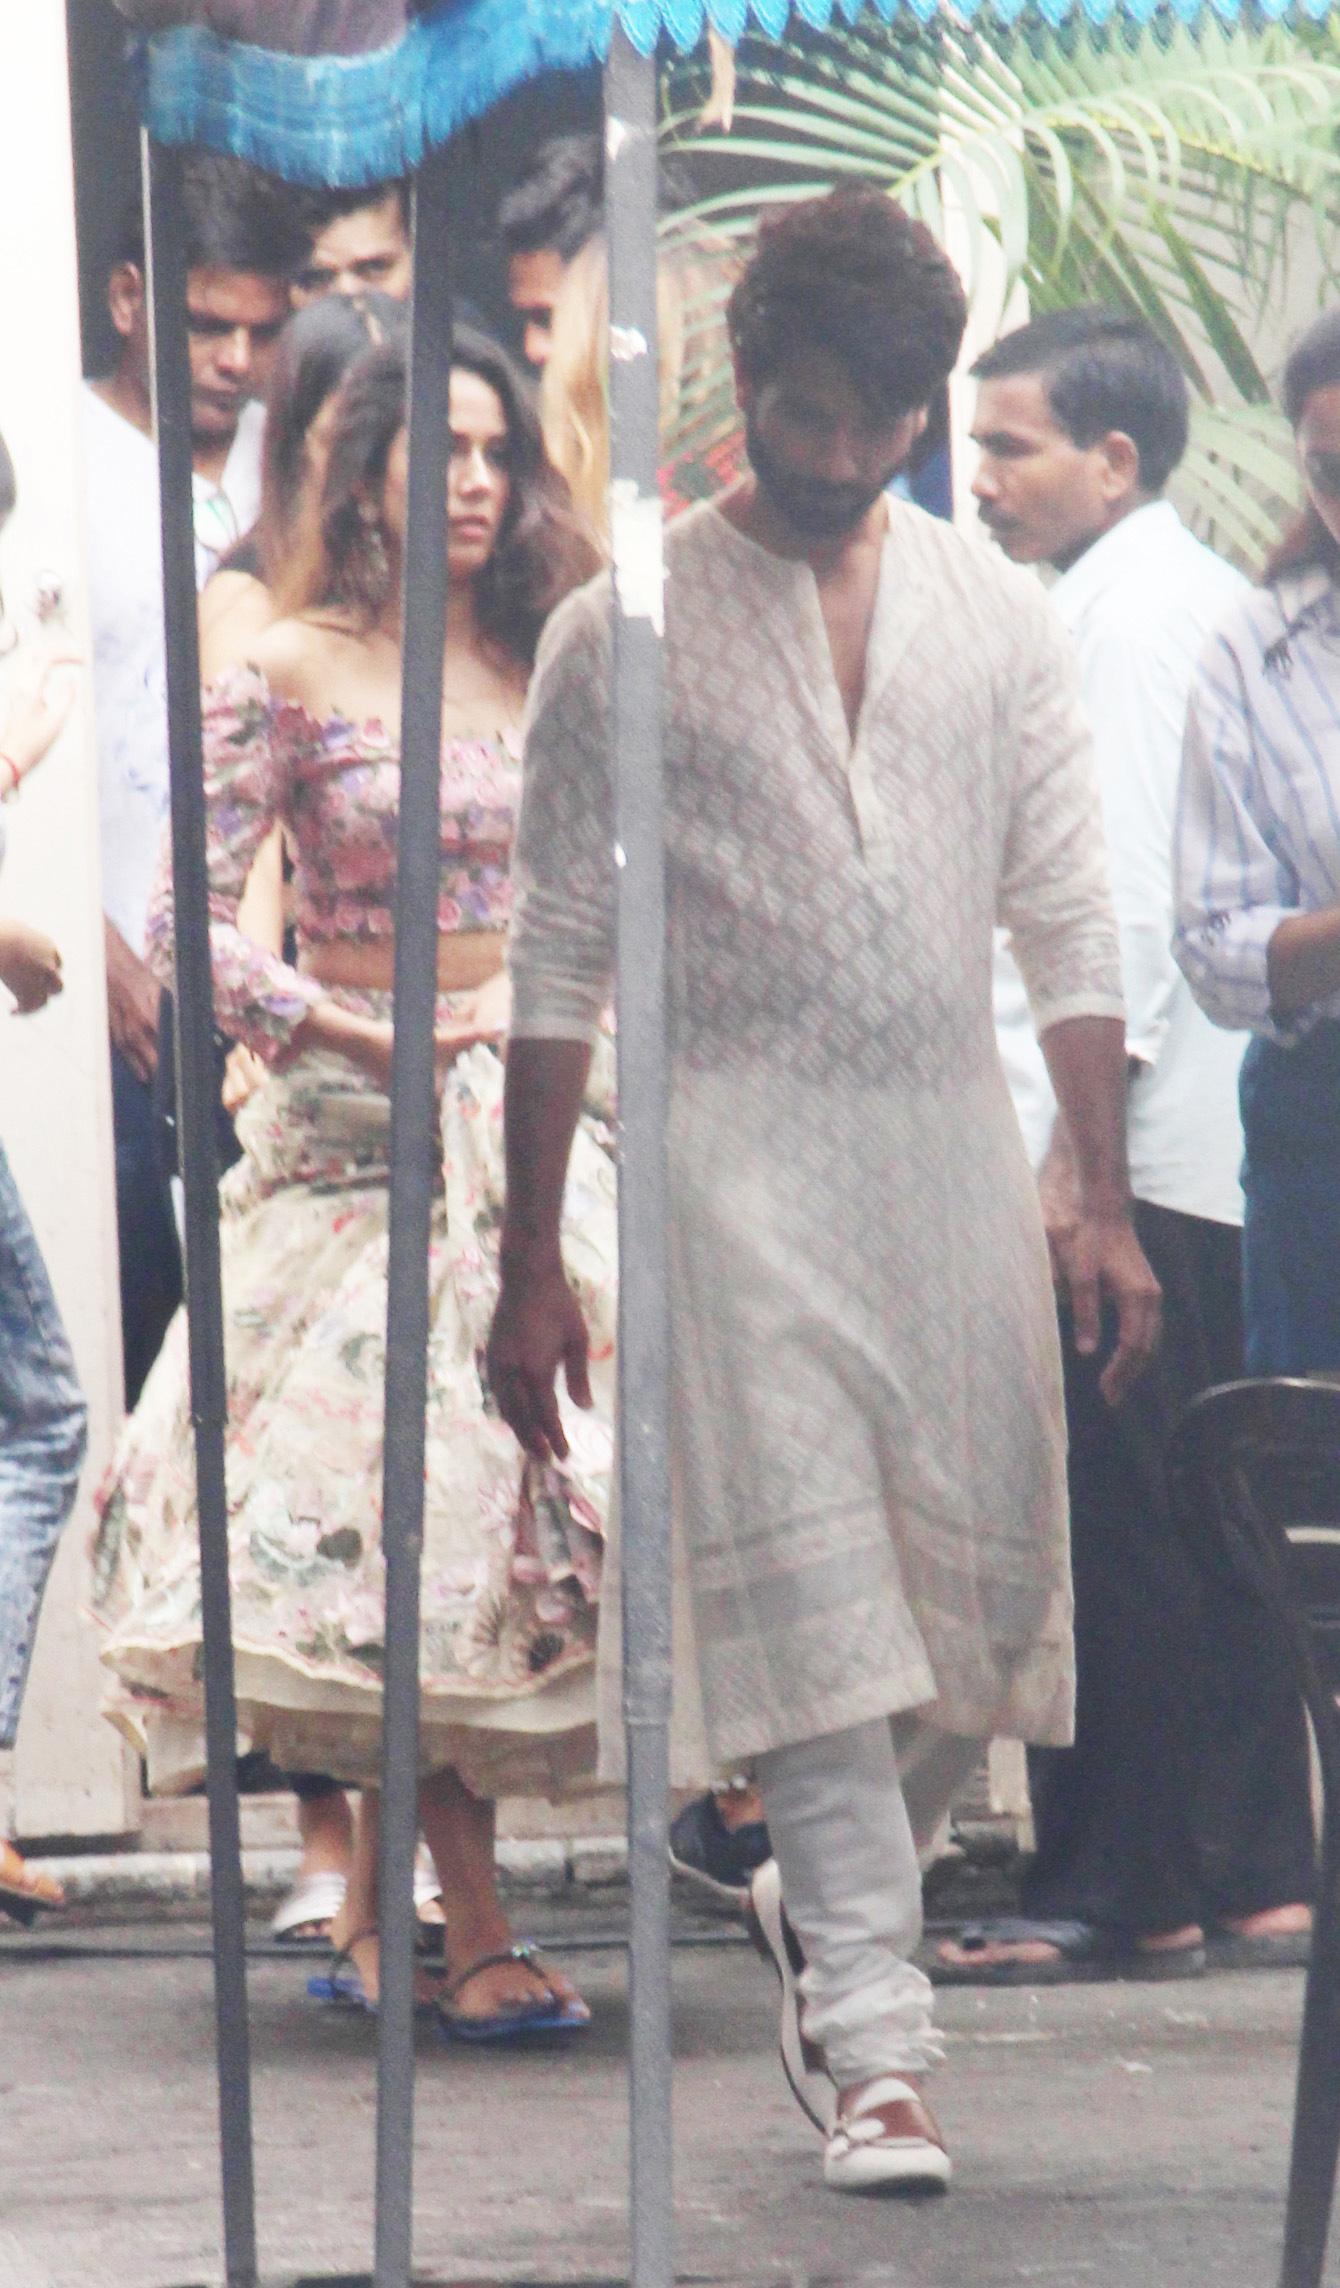 Bollywood Tadka,शाहिद कपूर इमेज,शाहिद कपूर फोटो,शाहिद कपूर पिक्चर, मीरा राजपूत इमेज,मीरा राजपूत फोटो,मीरा राजपूत पिक्चर